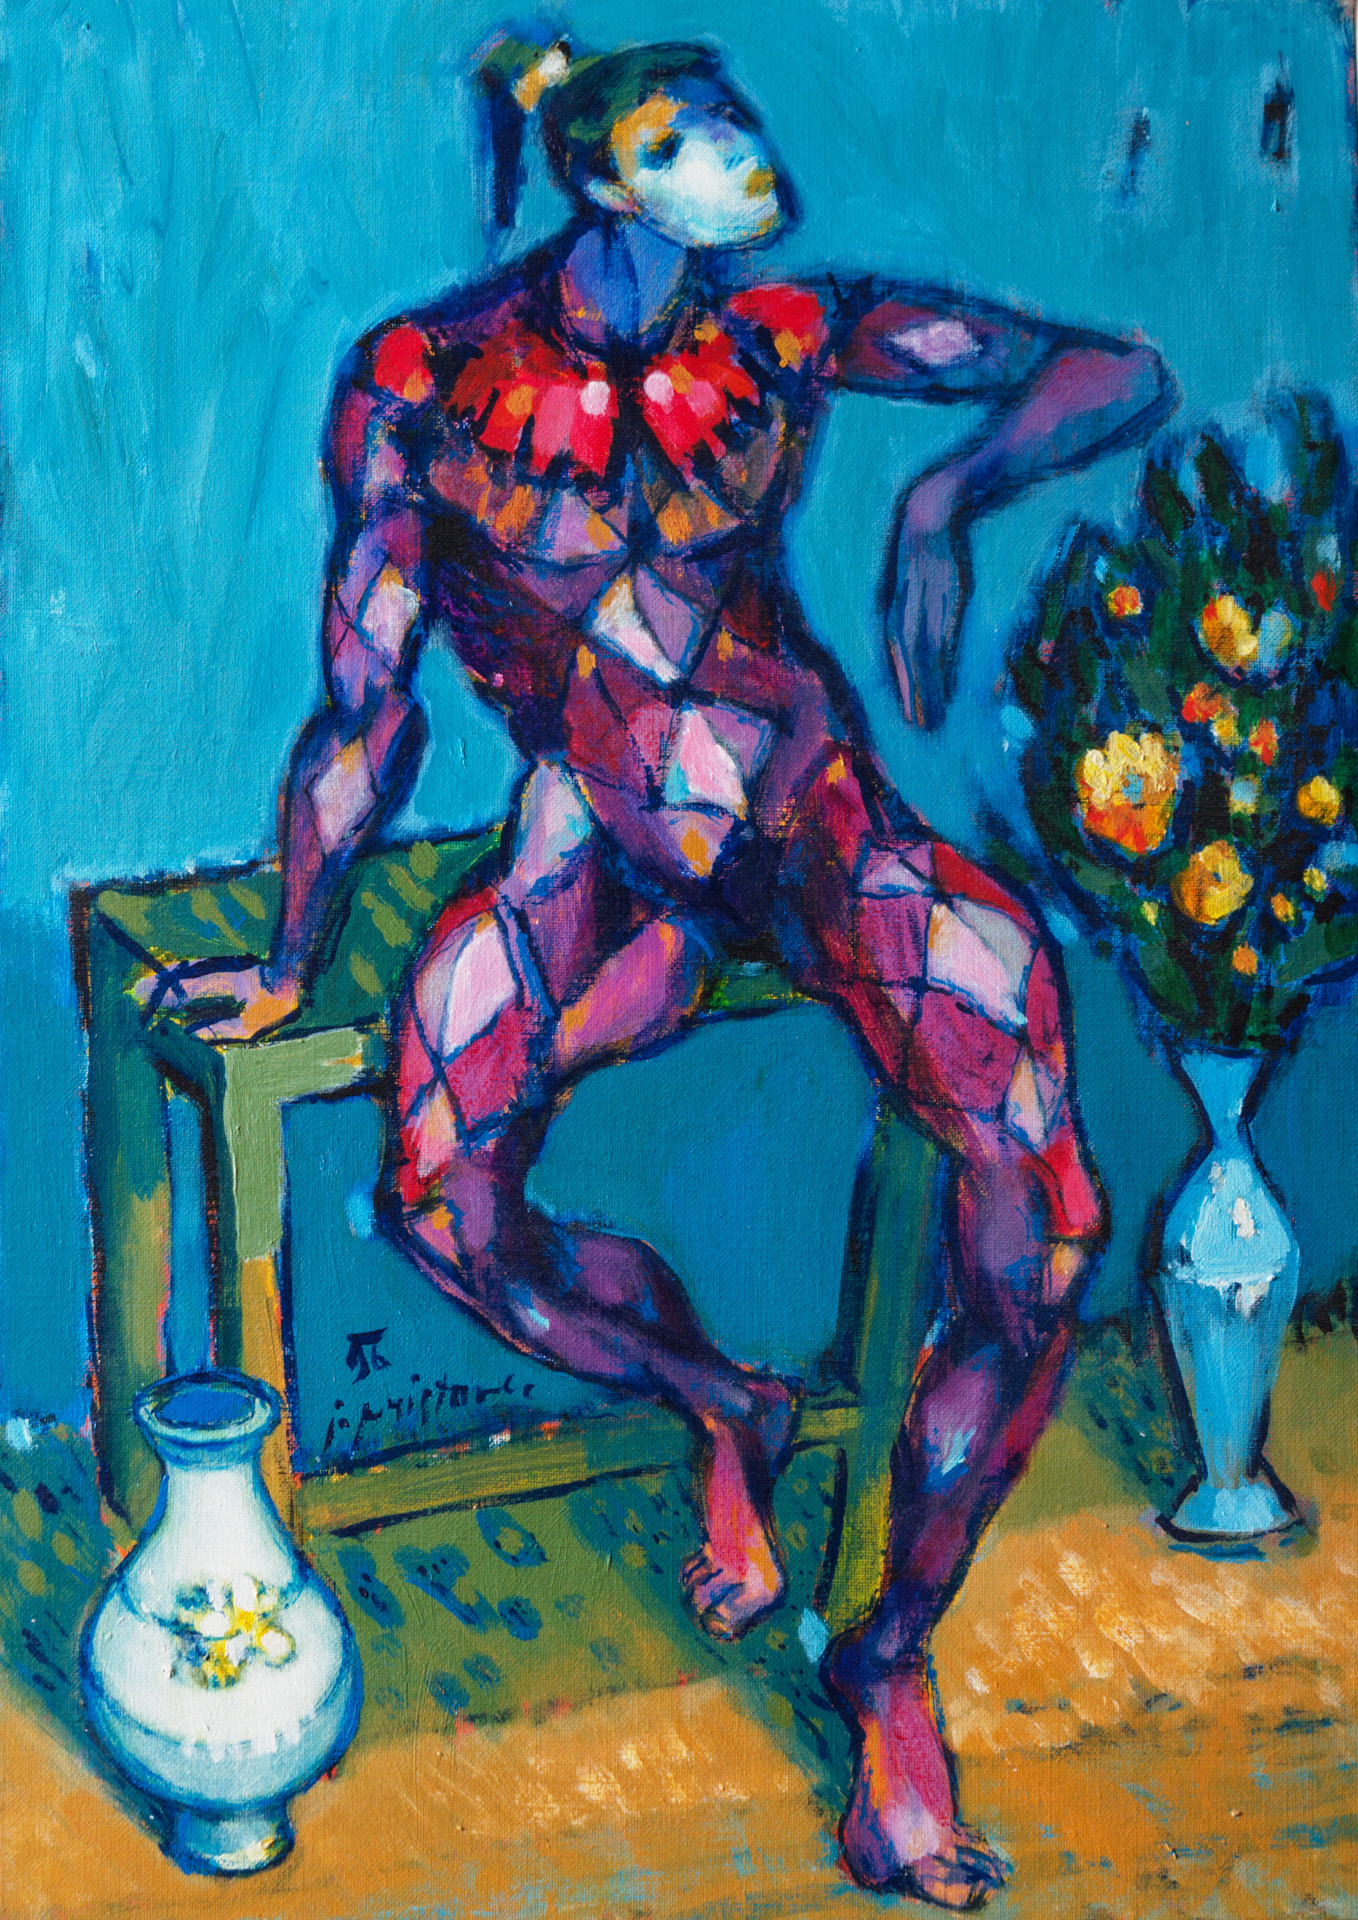 Harlequin  /  1996 / oil on canvas / 50x70 cm